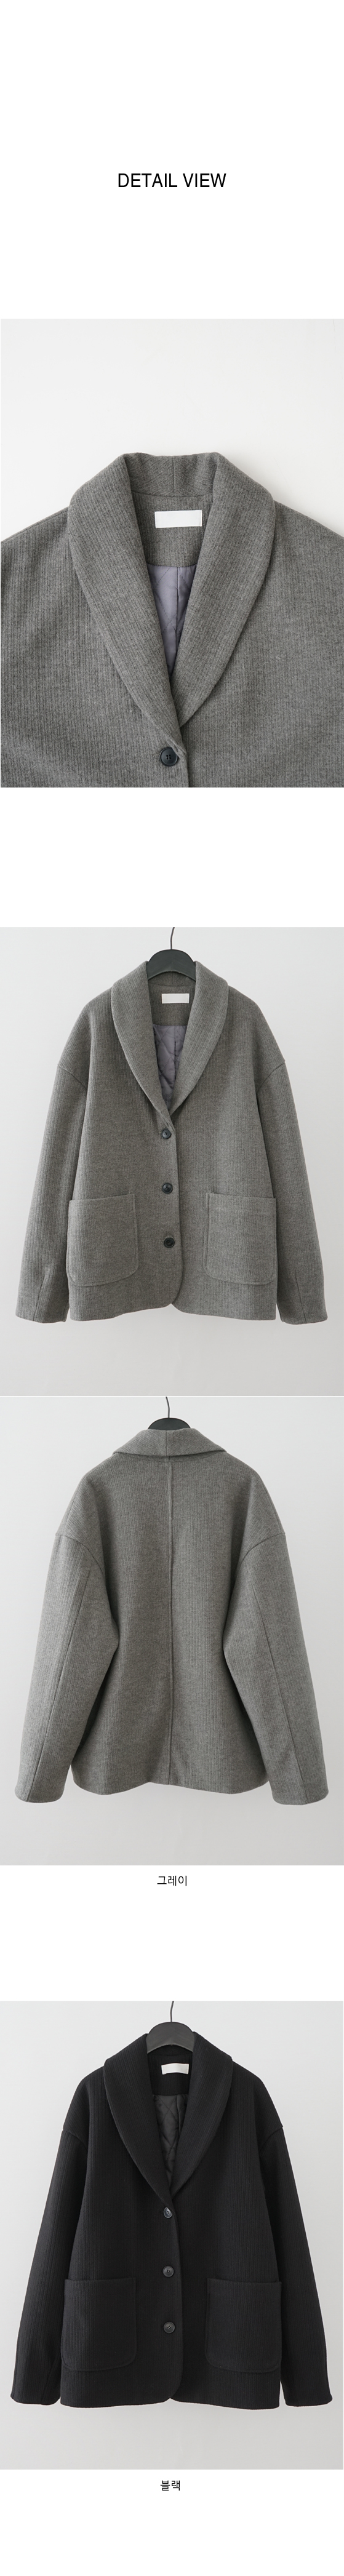 shawl collar inner quilting jacket